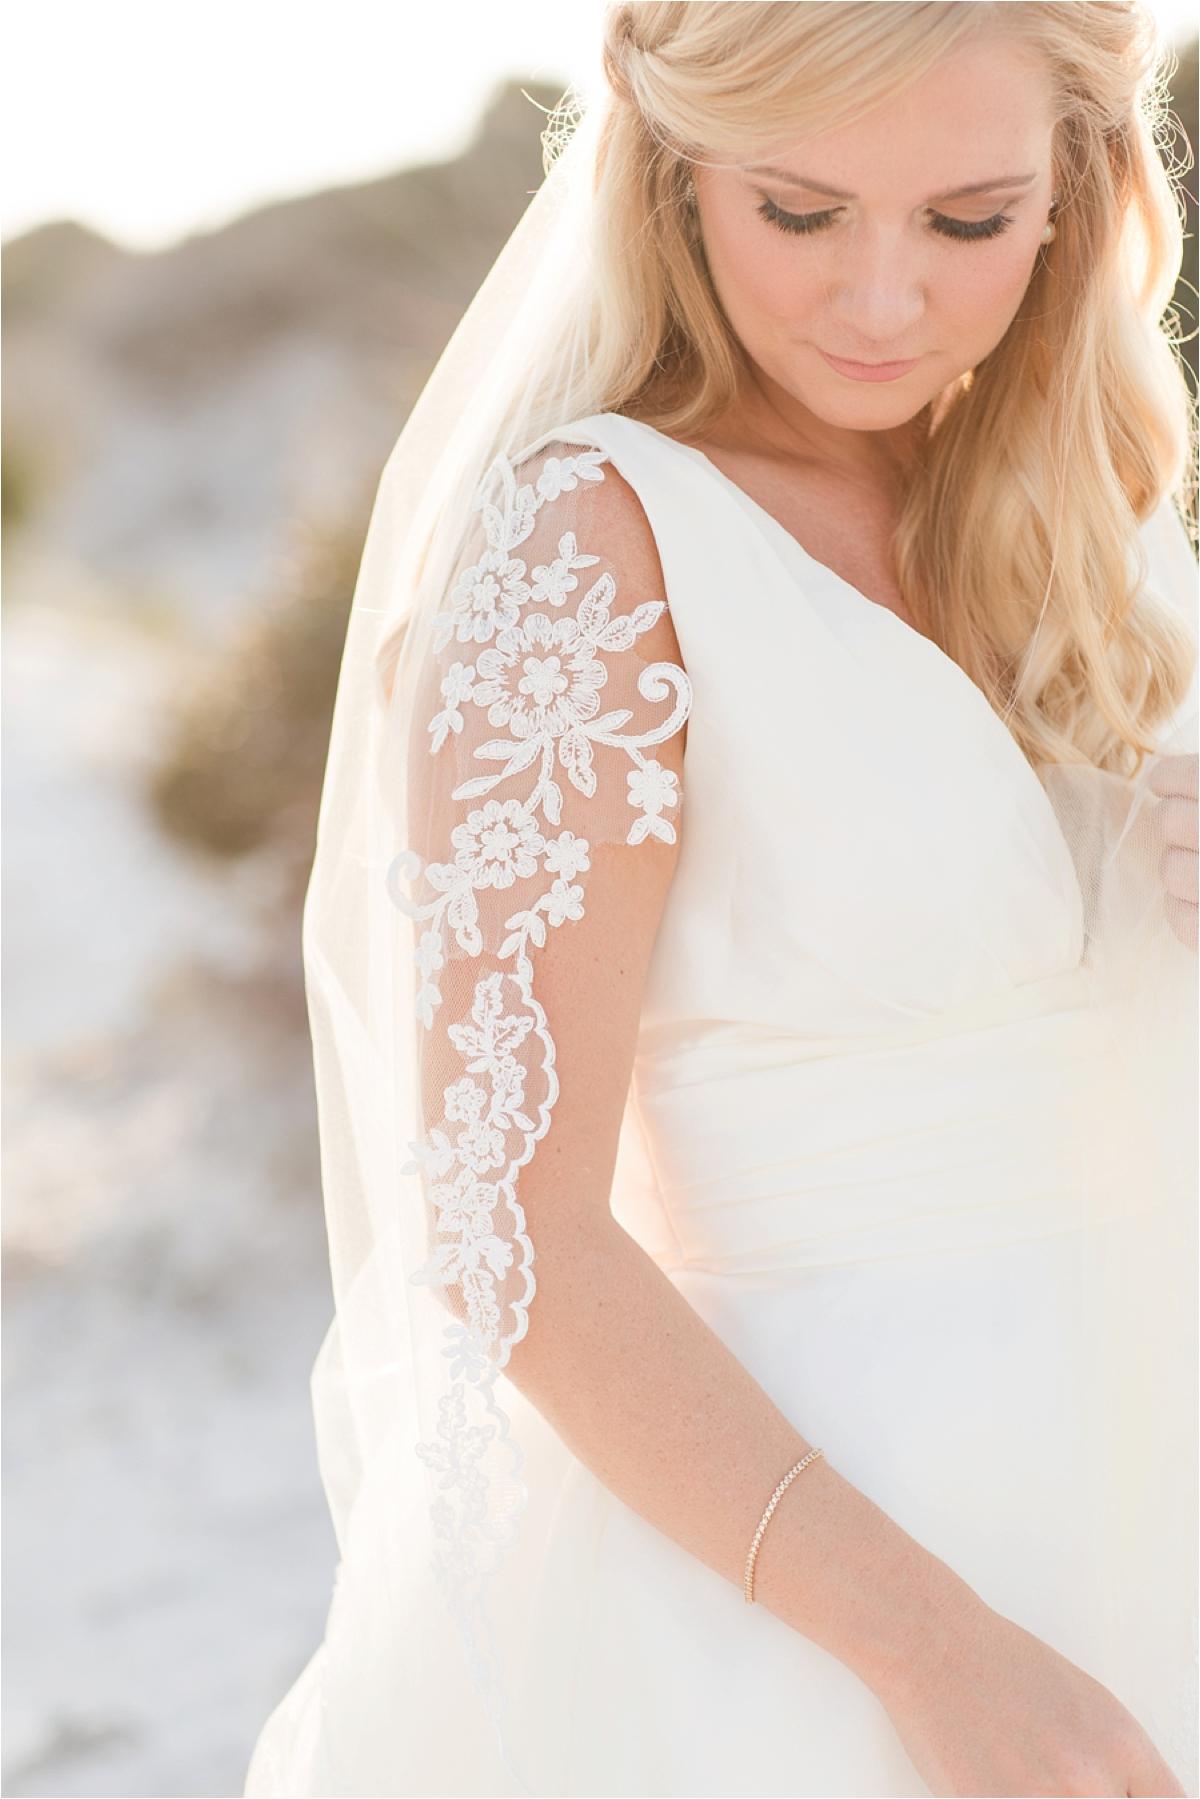 Seaside Florida Bridal Portrait Photographer-Catherine Carter-Florida bride-Beach Bridal Shoot-Alabama photographer-Sunset bridal shoot